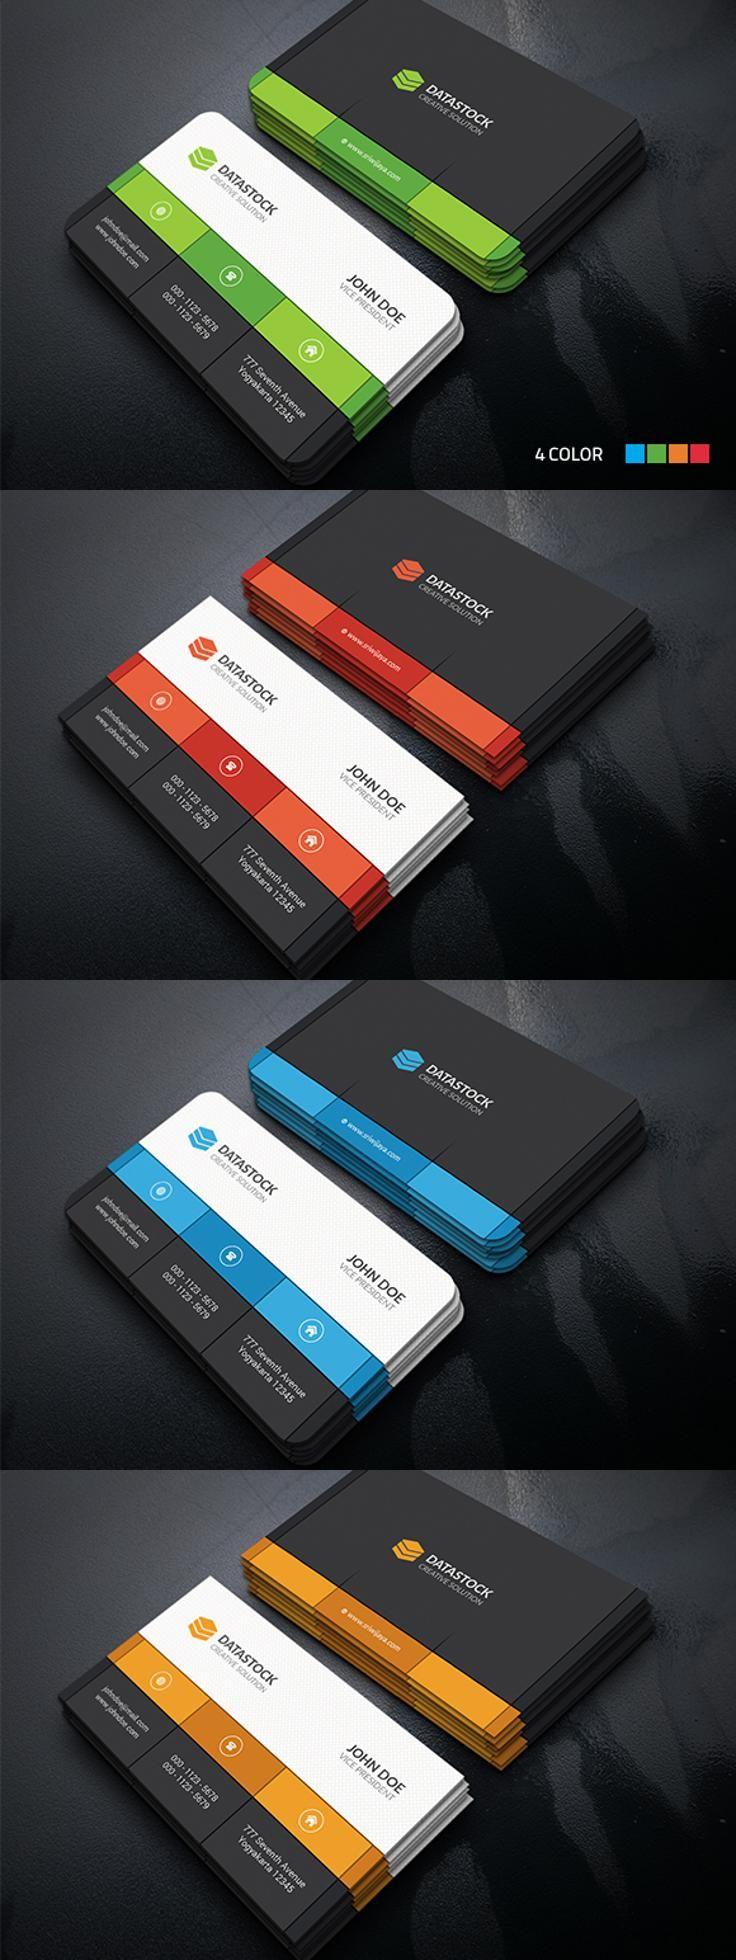 #businesscard #design from InfinityArt | DOWNLOAD: creativemarket.co...